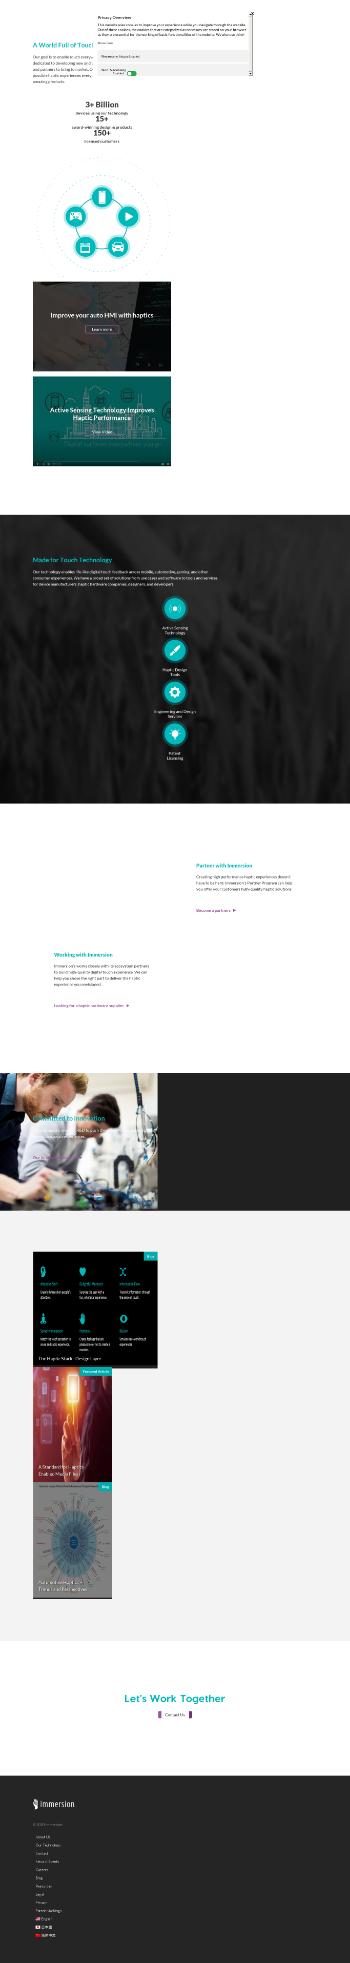 Immersion Corporation Website Screenshot